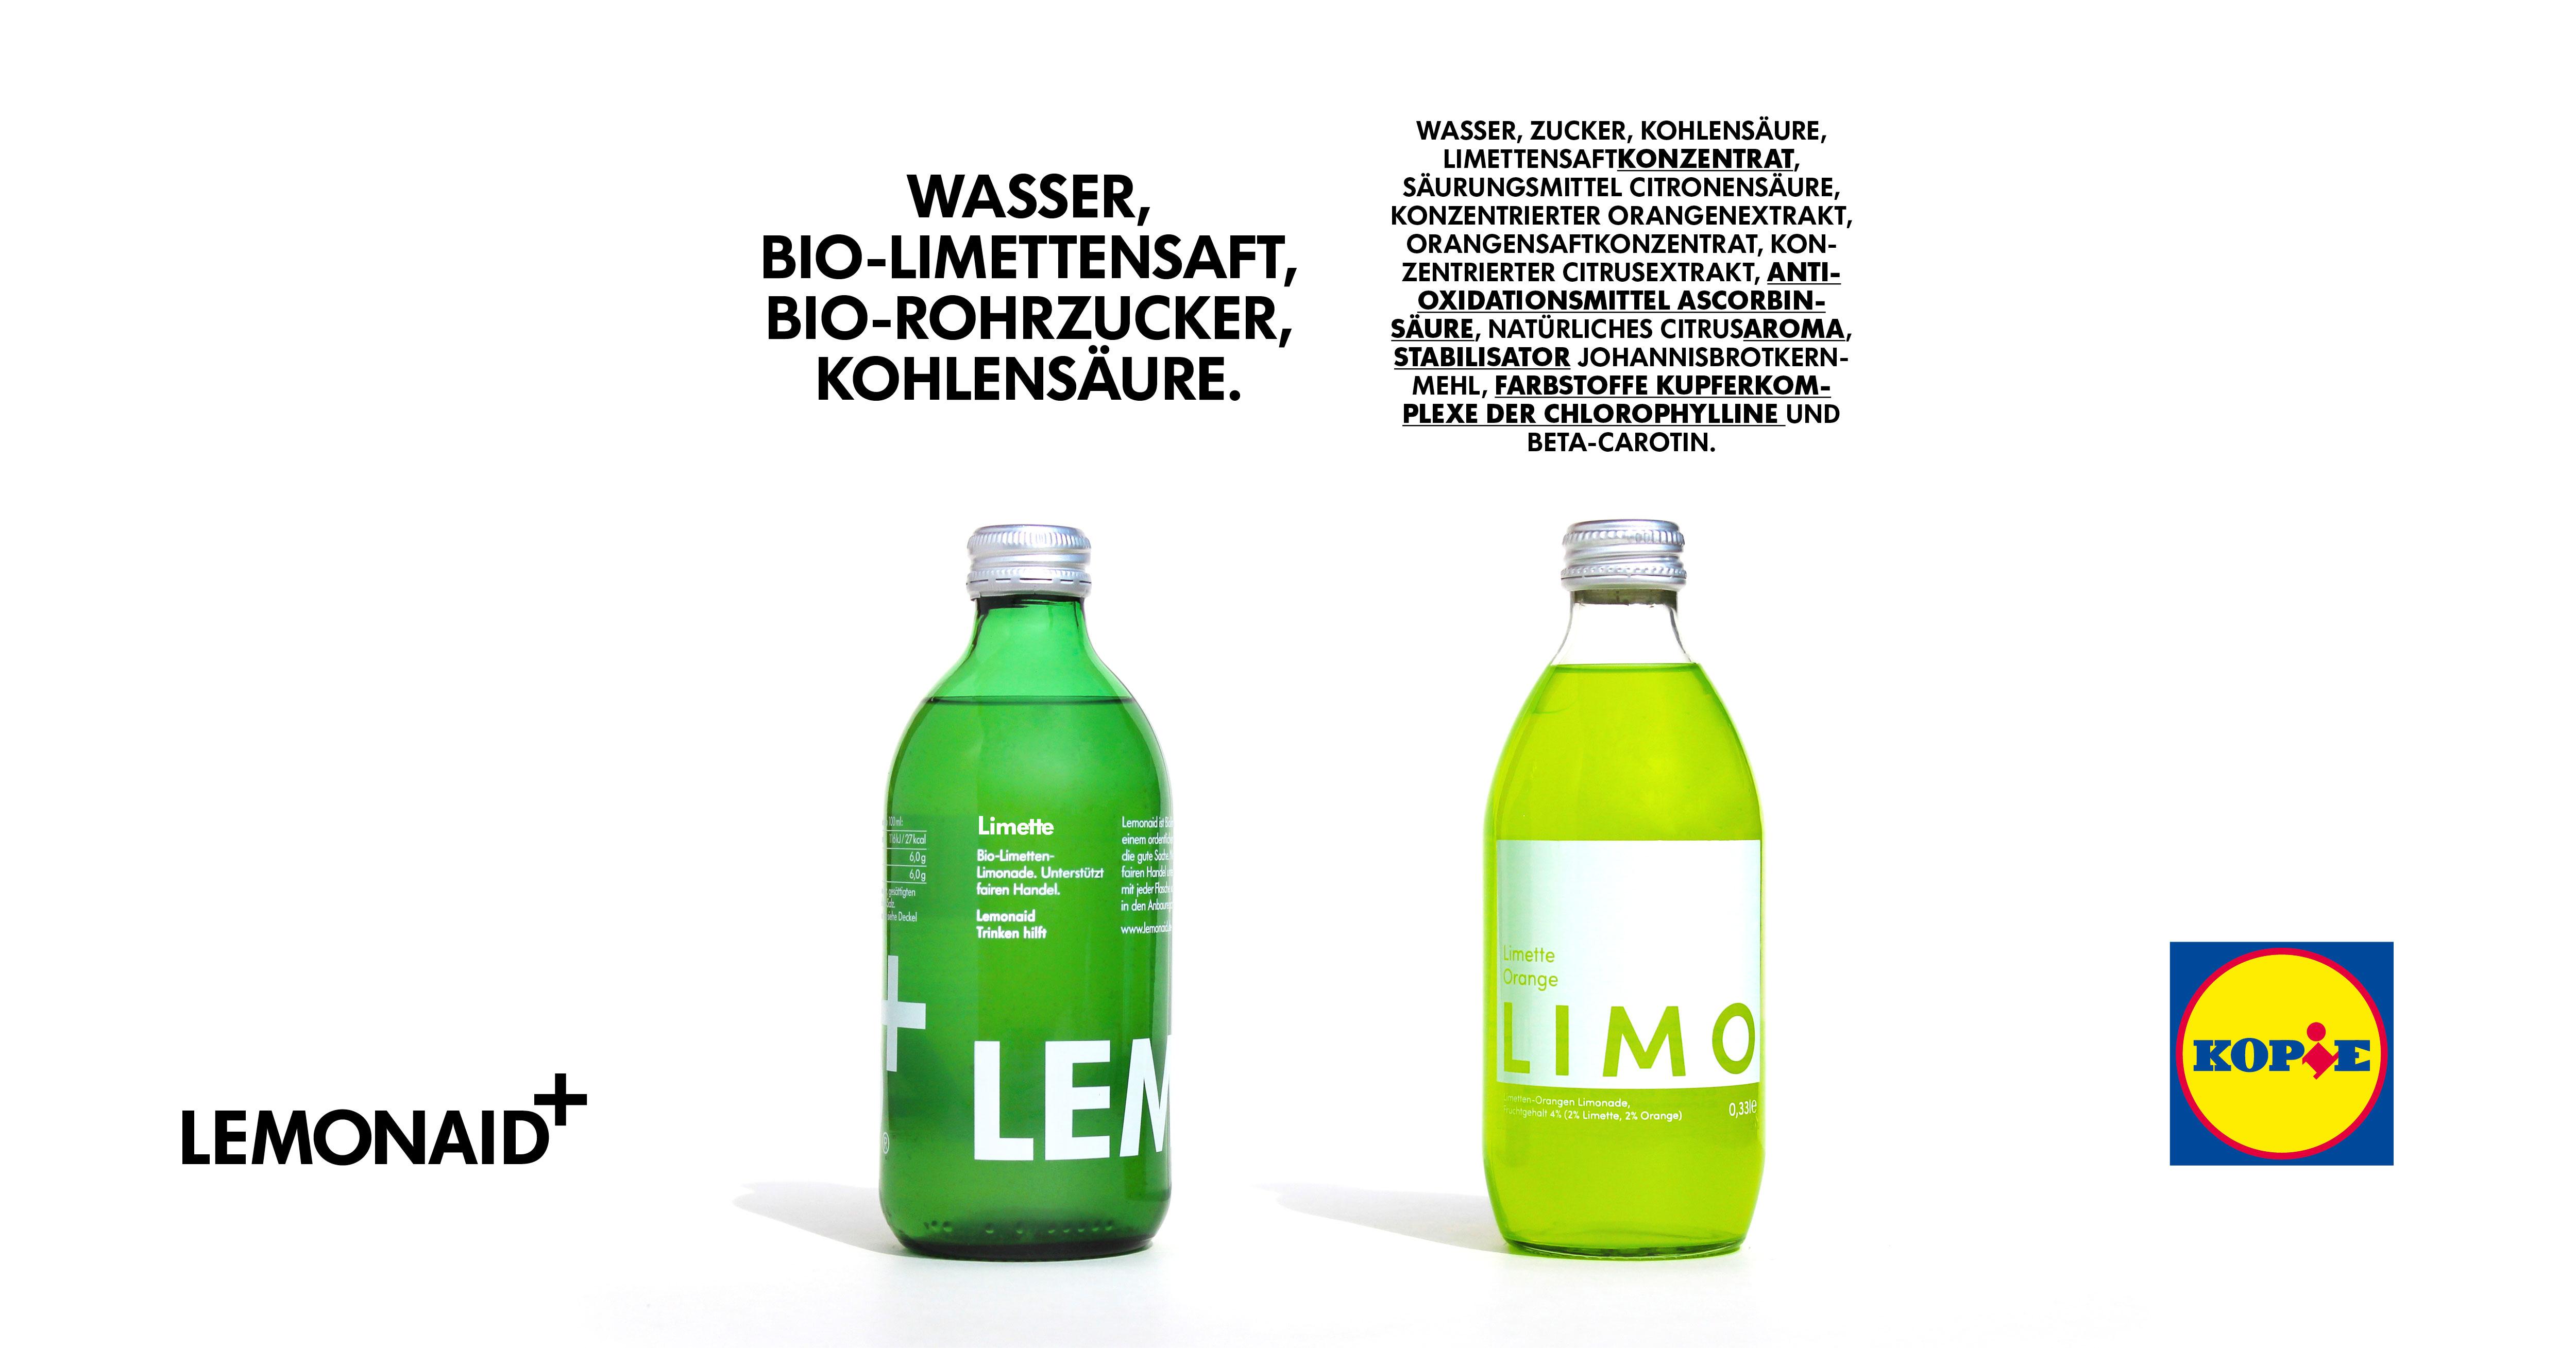 Limonaid